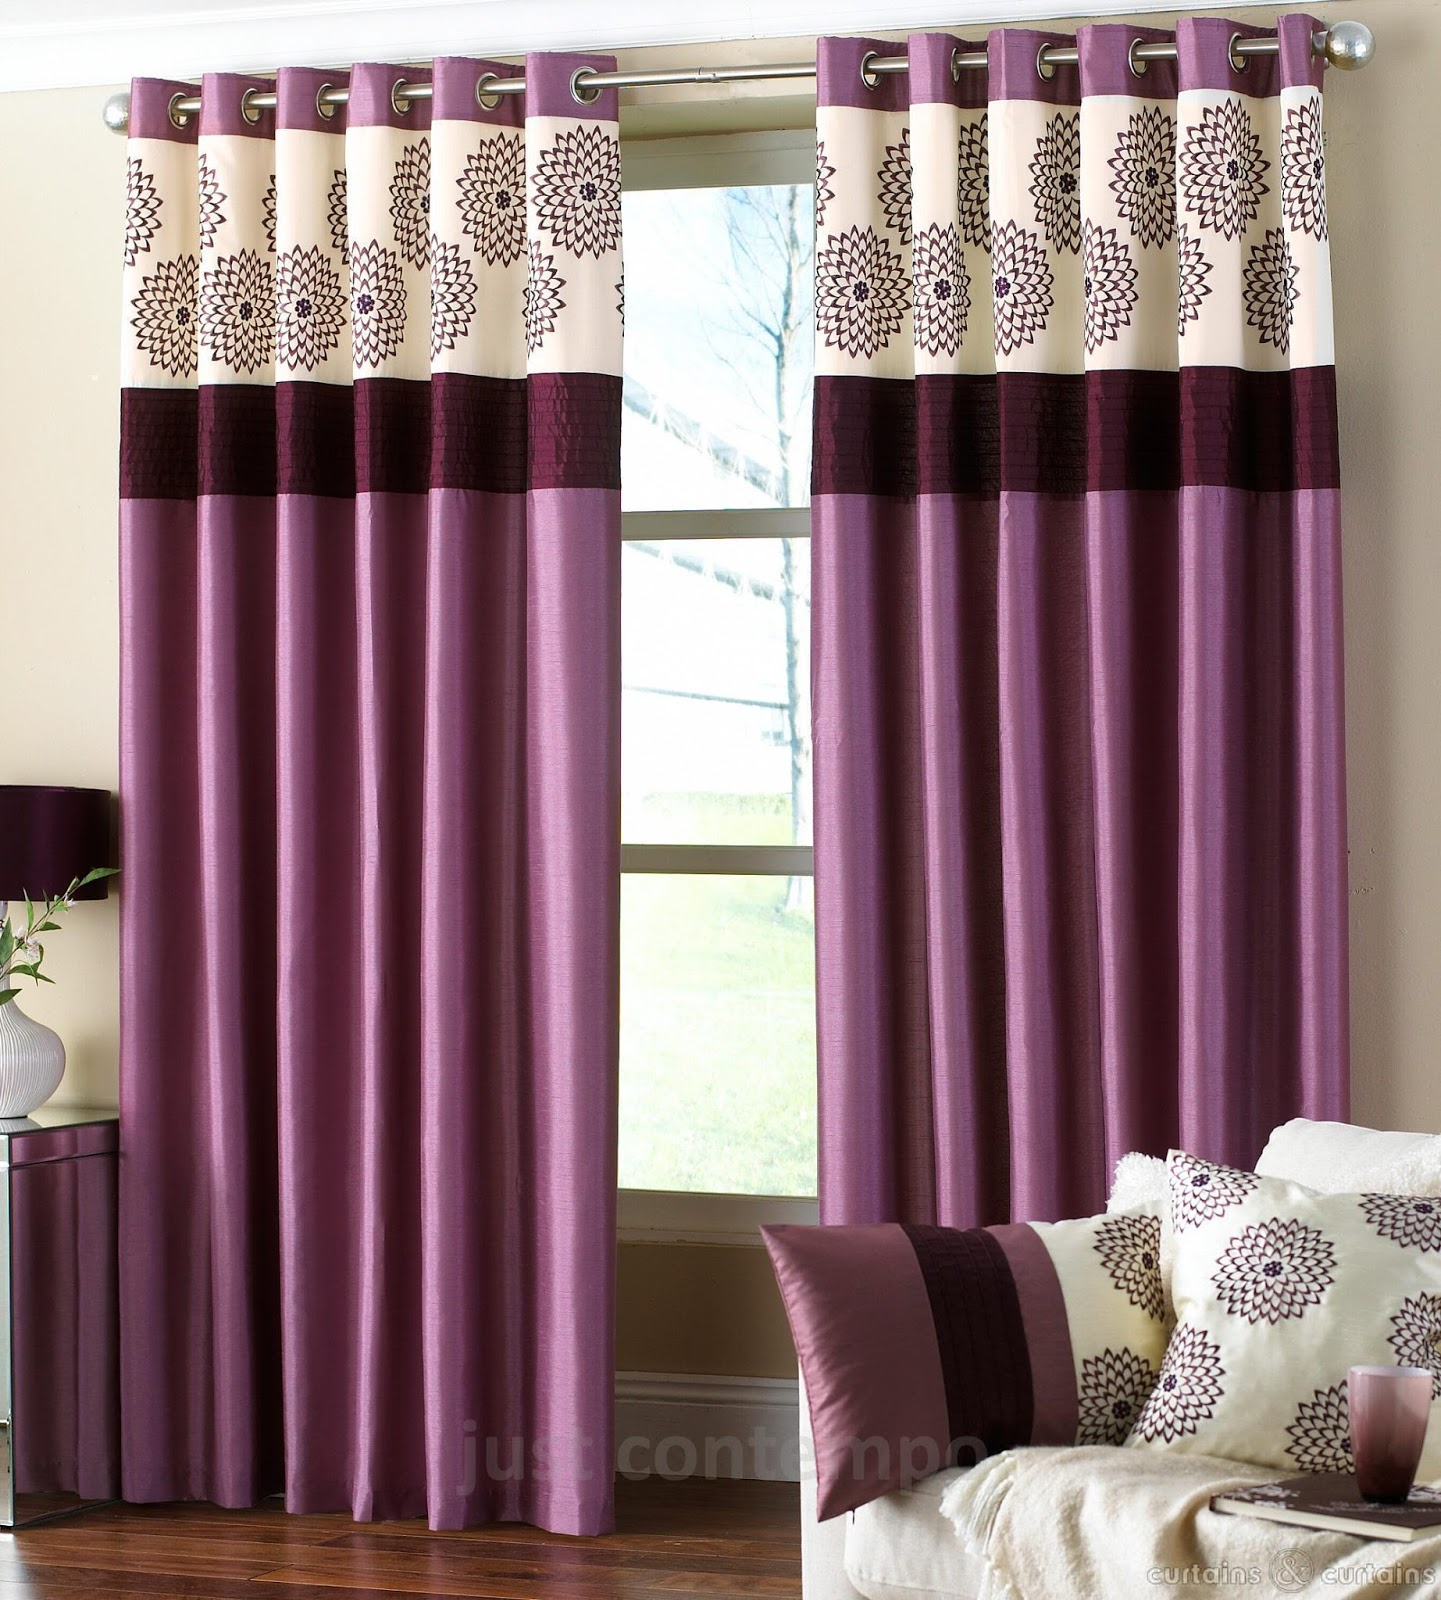 Curtain Valance Patterns Free Rod Set Sewing